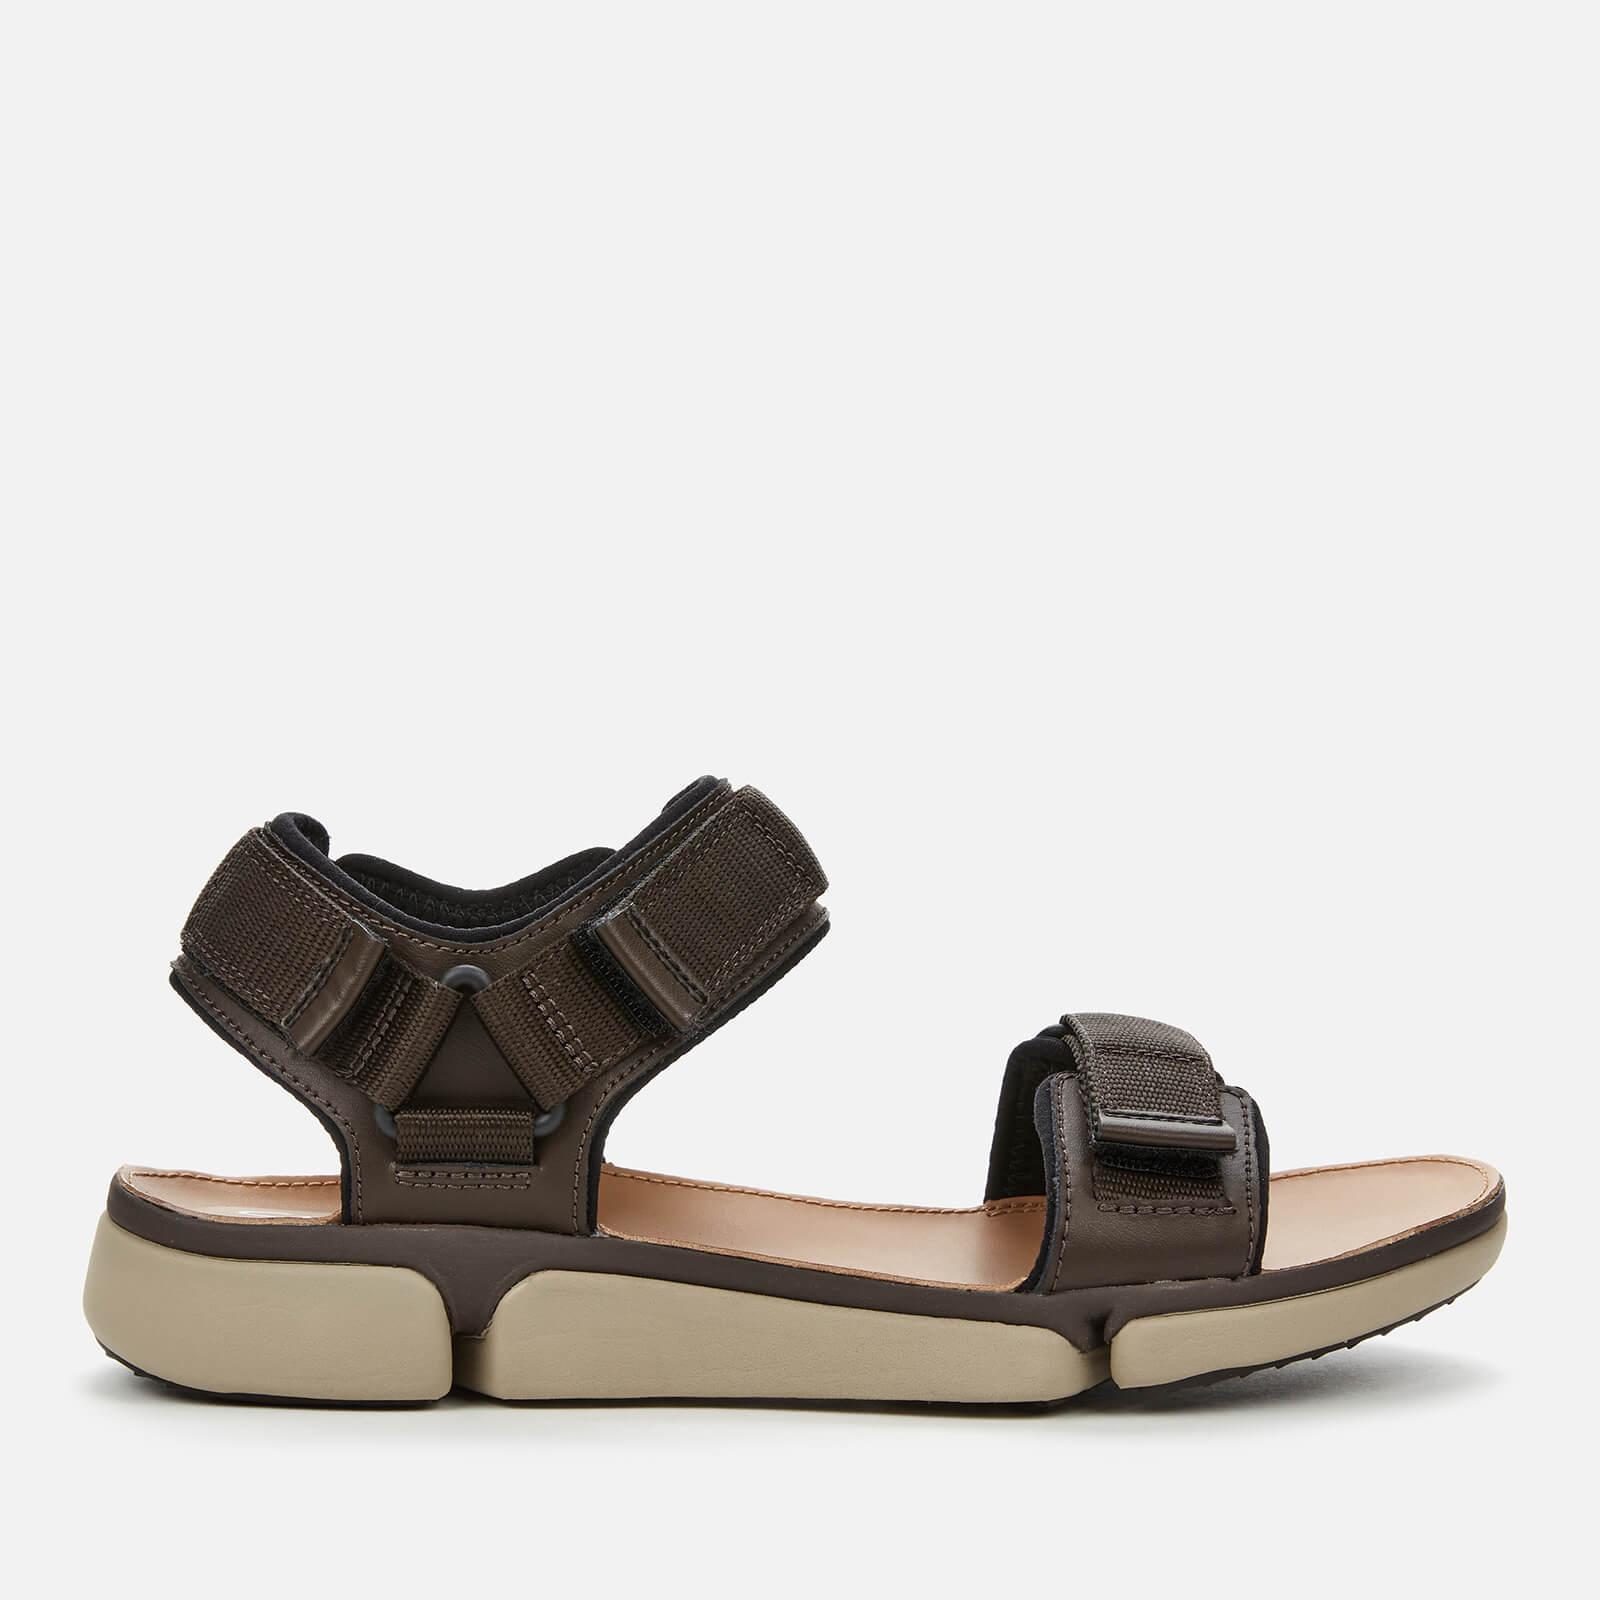 Clarks Men's Tri Cove Trail Outdoor Sandals - Dark Brown Combi - UK 10